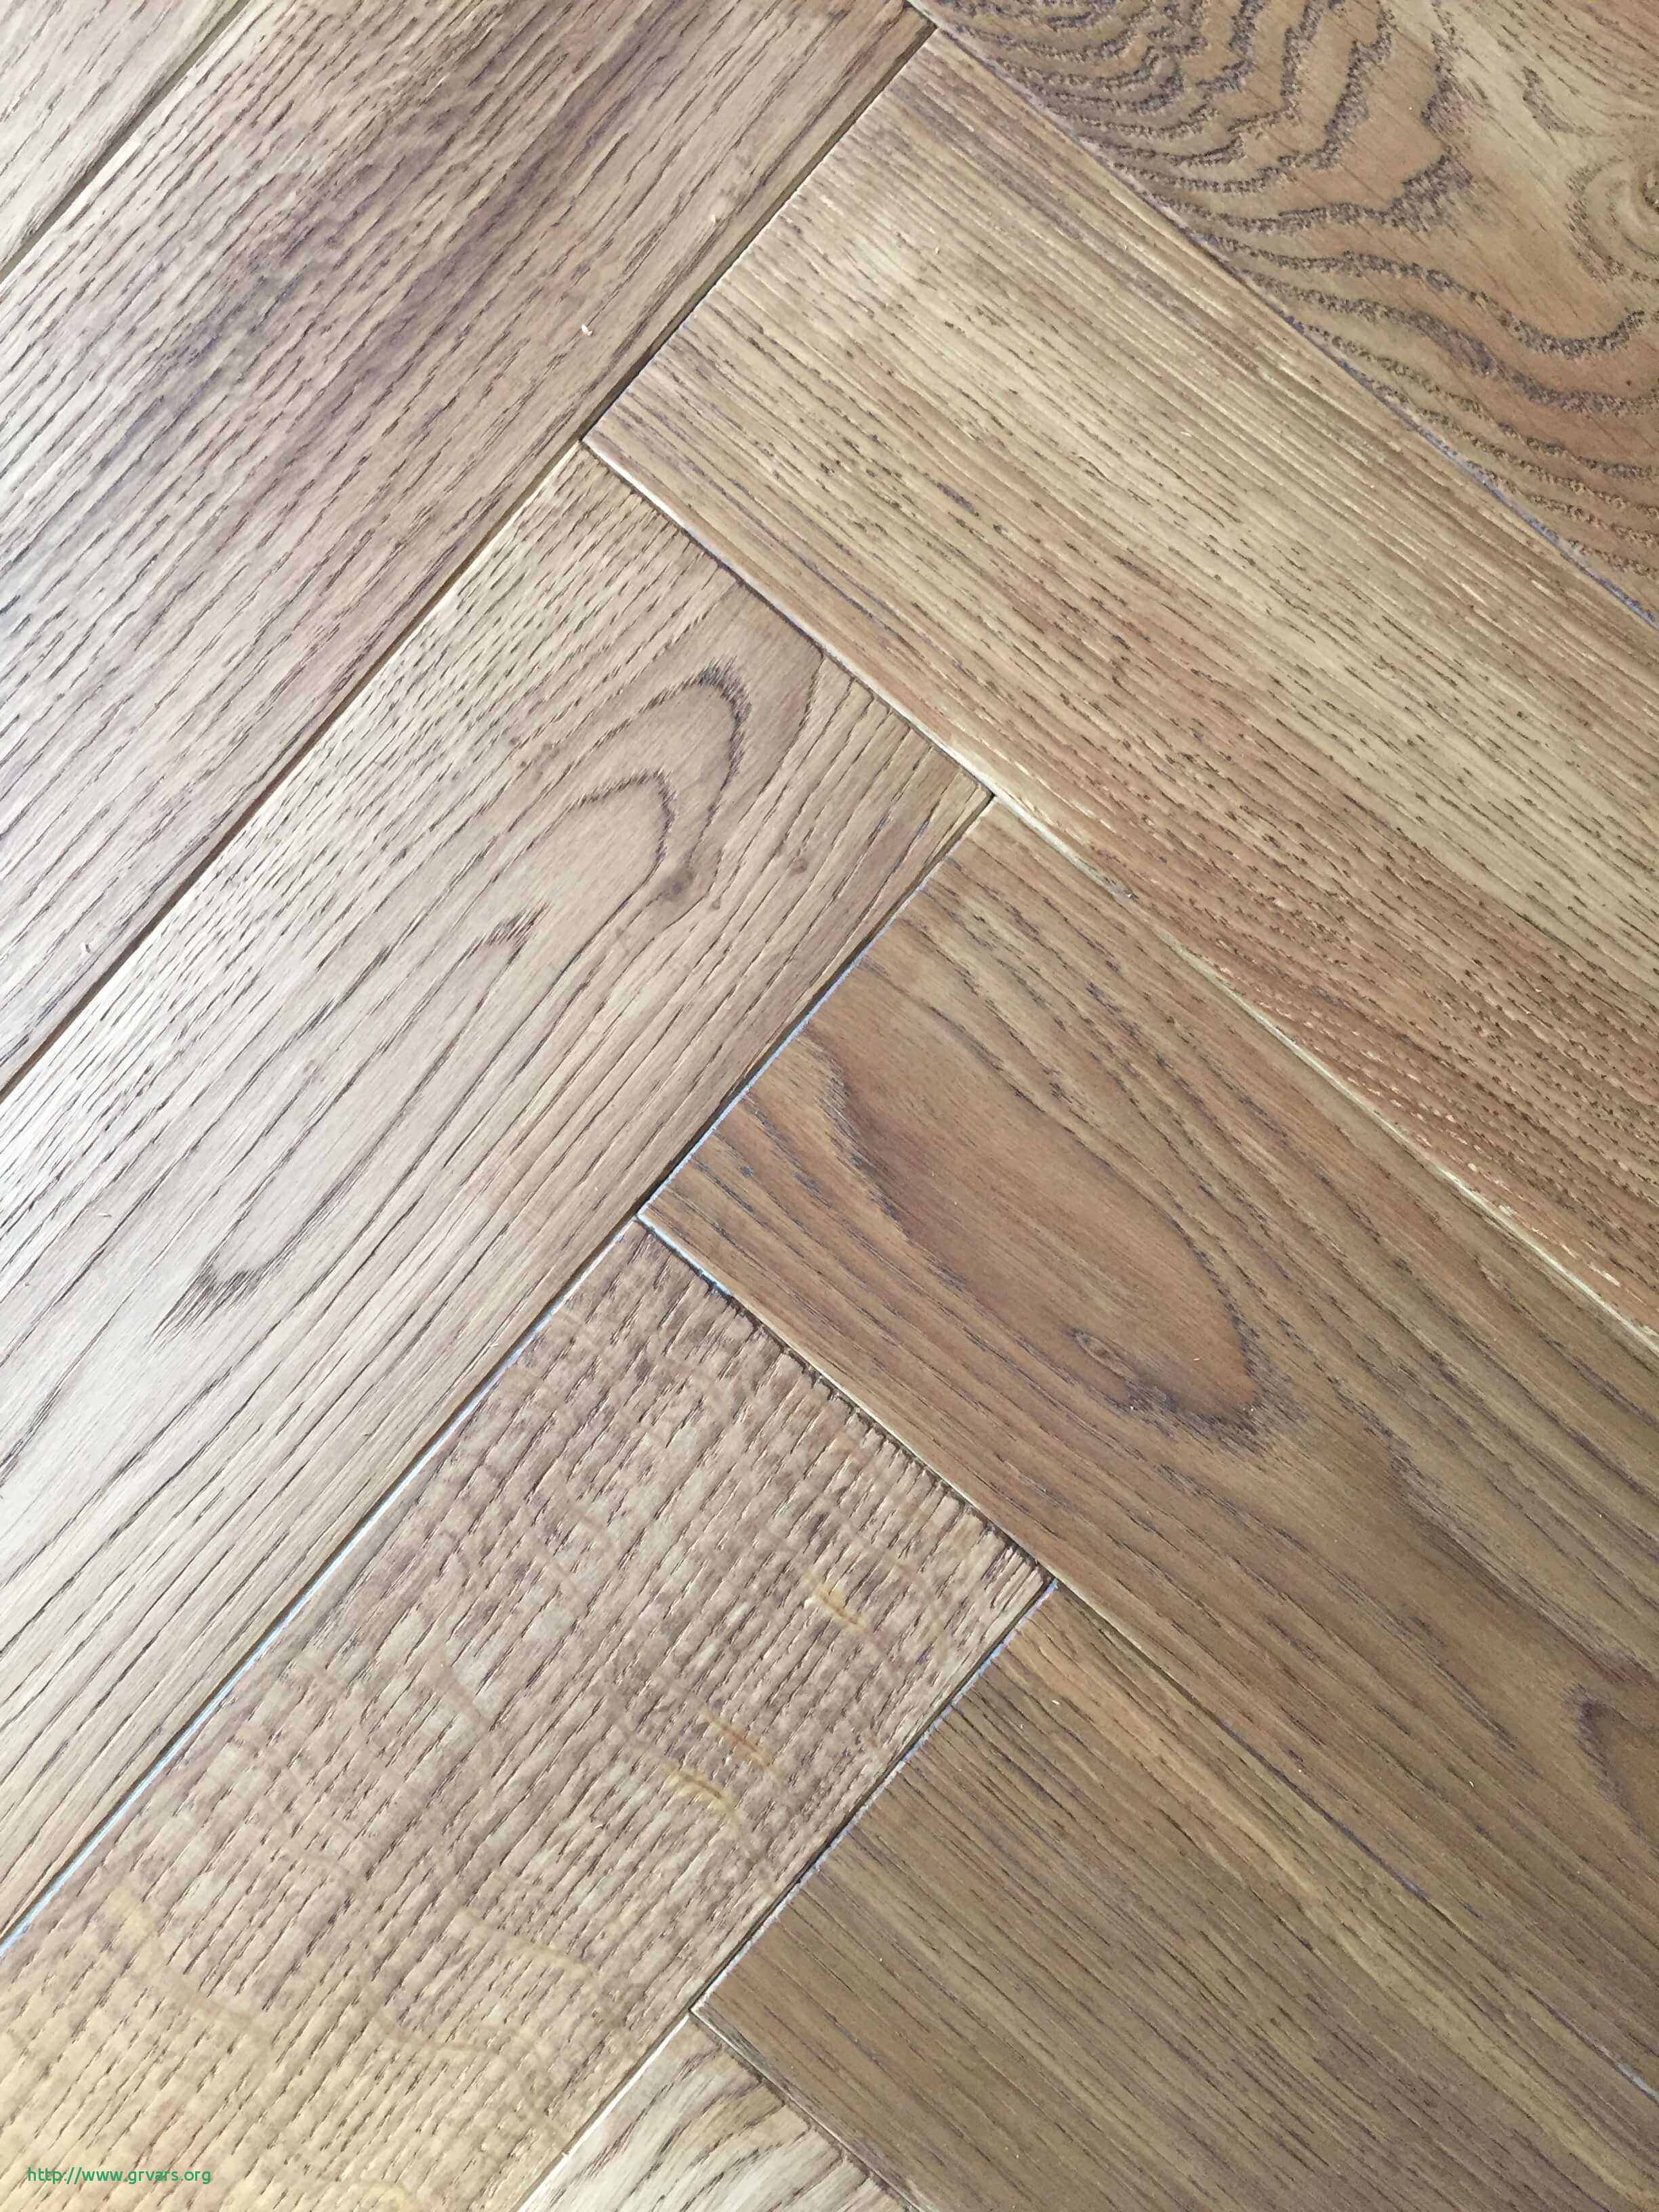 exotic hardwood flooring manufacturers of 19 frais laminate flooring compared to hardwood ideas blog with wood laminate flooring 26 laminate flooring compared to hardwood beau laminate flooring ideas